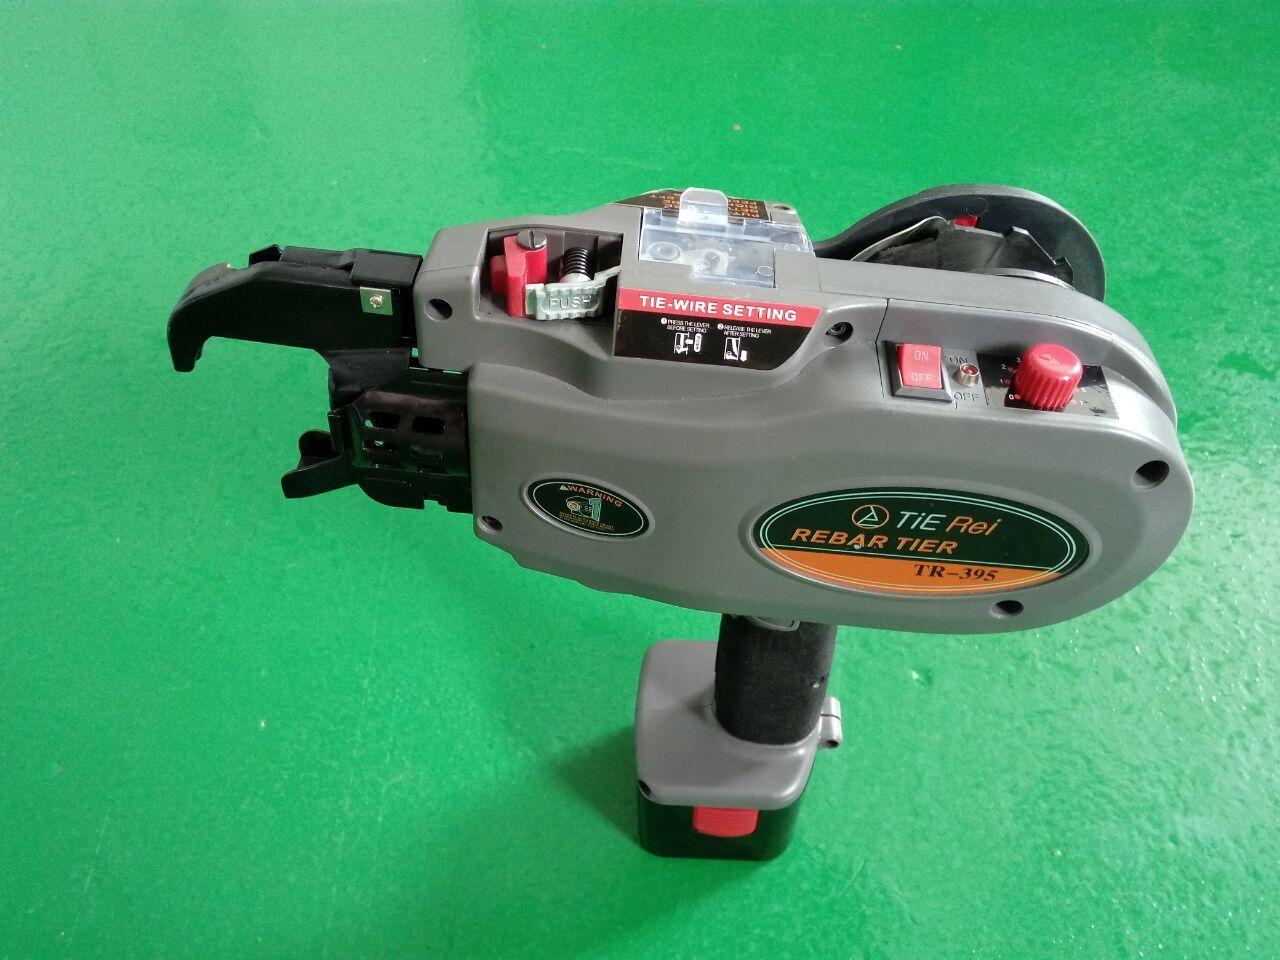 TieRei Rebar Tying Tool TR395 Rebar Tier Machine purchasing, souring ...